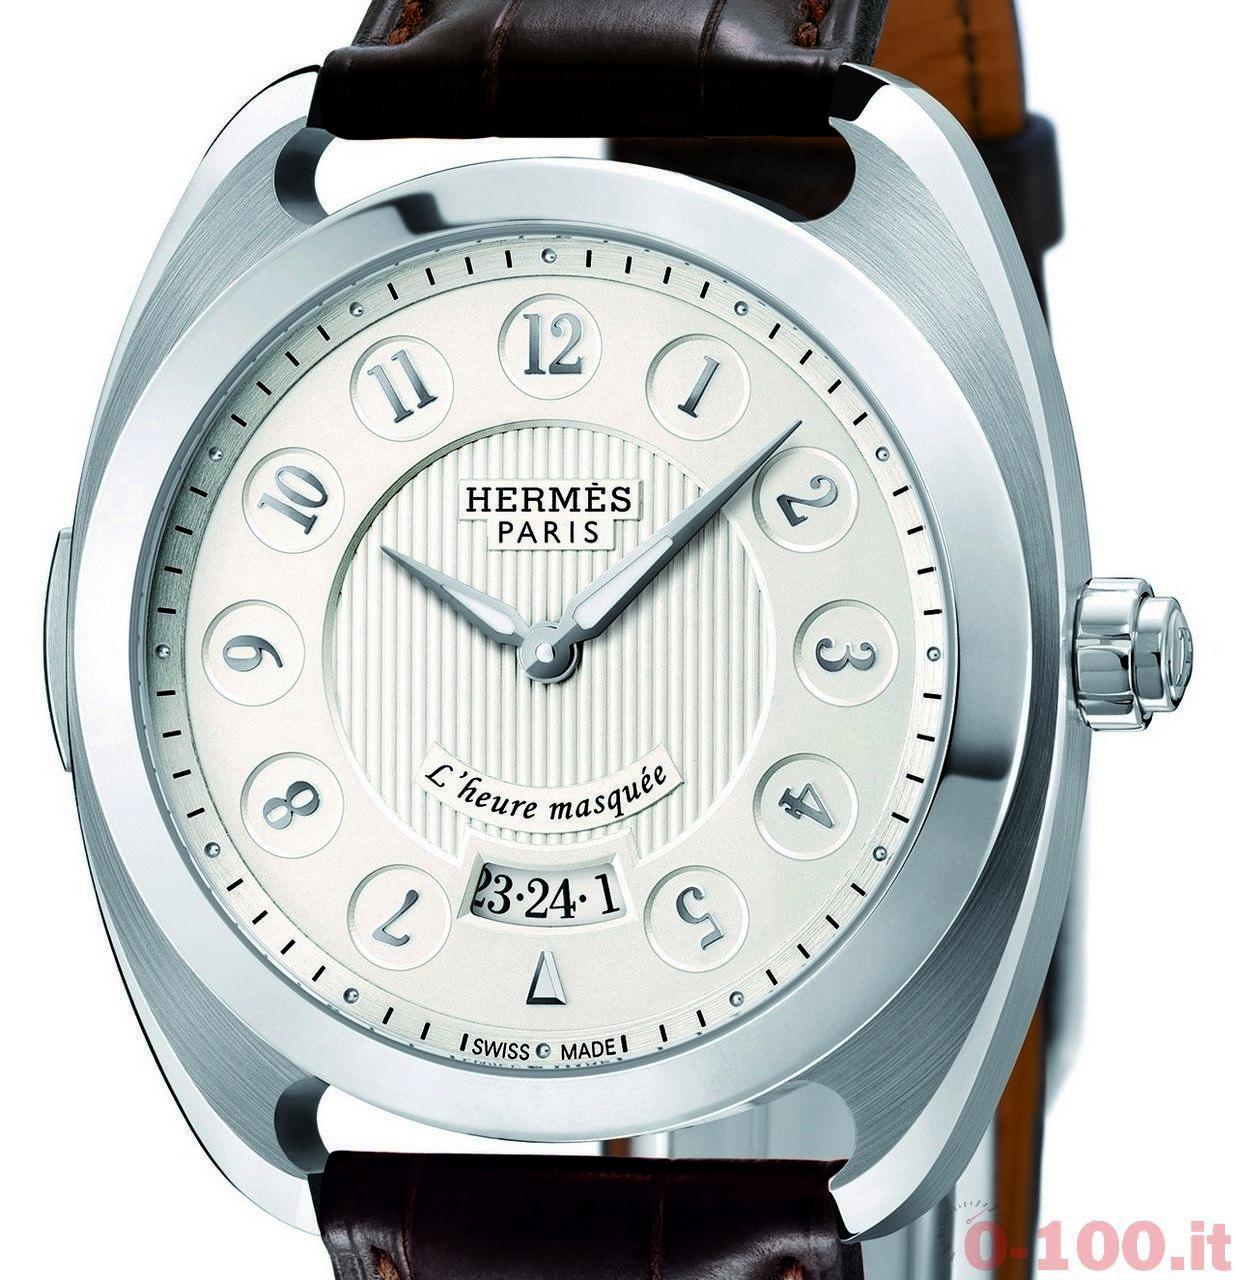 baselworld-2014-Hermès Dressage L'heure masque_0-1005